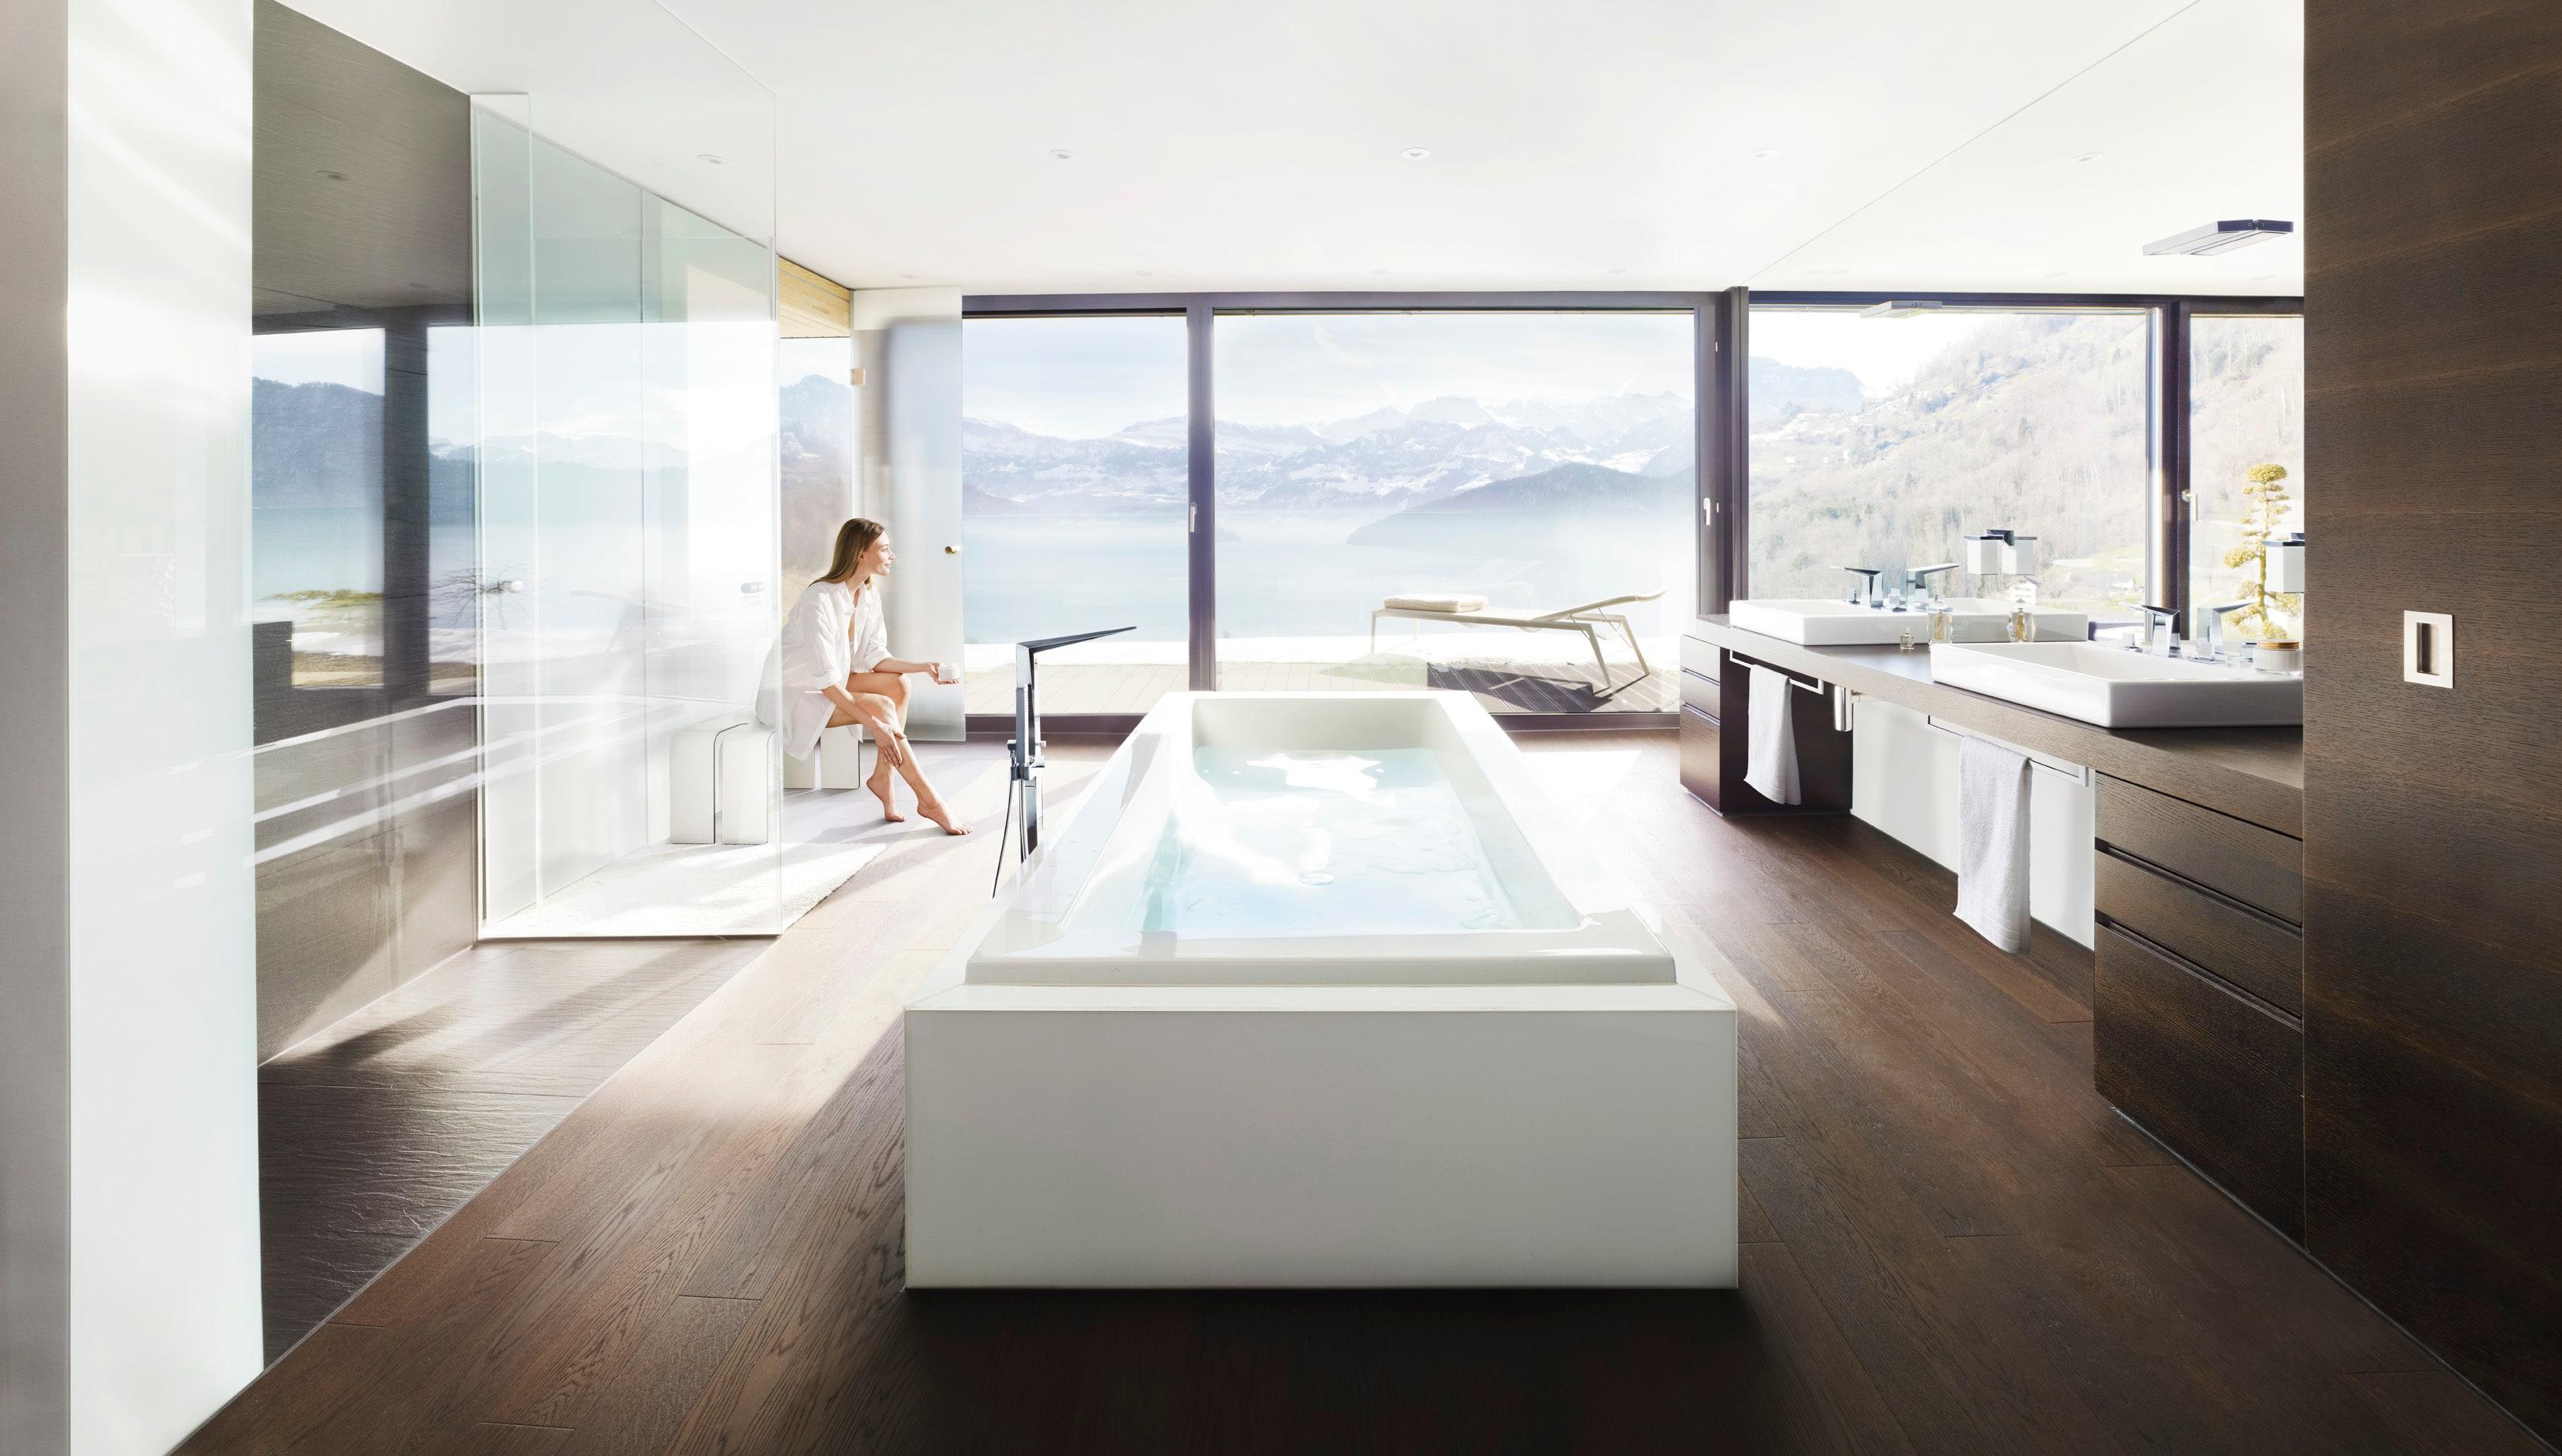 Grohe 23119000 Starlight Chrome Allure Brilliant Tub Filler Floor ...